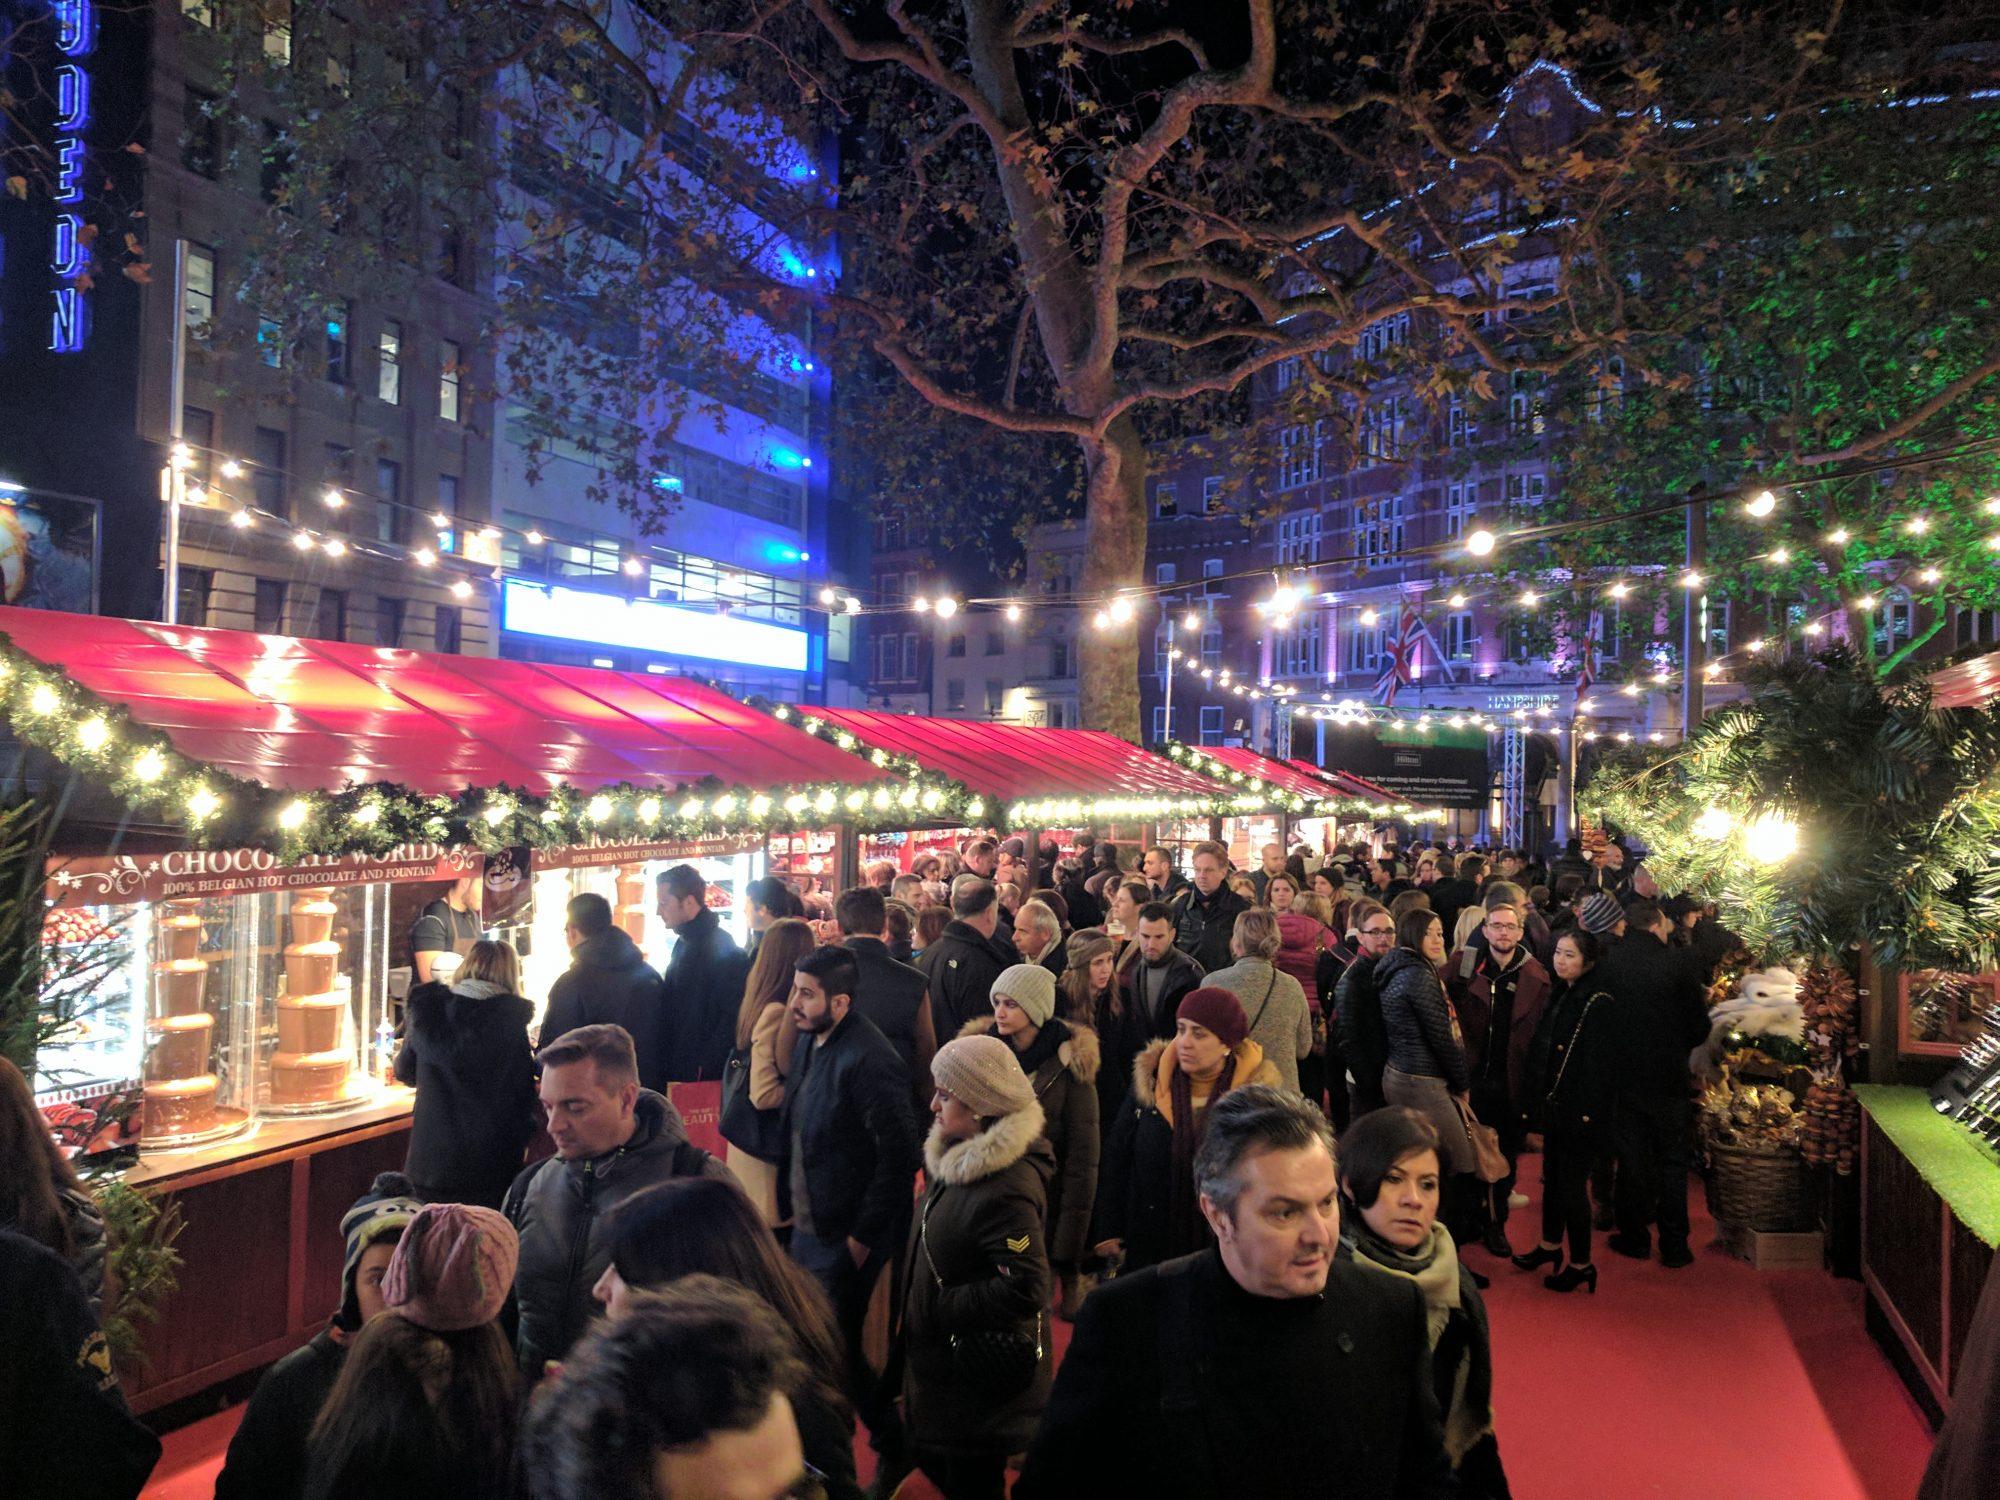 London Christmas market - Google Pixel camera